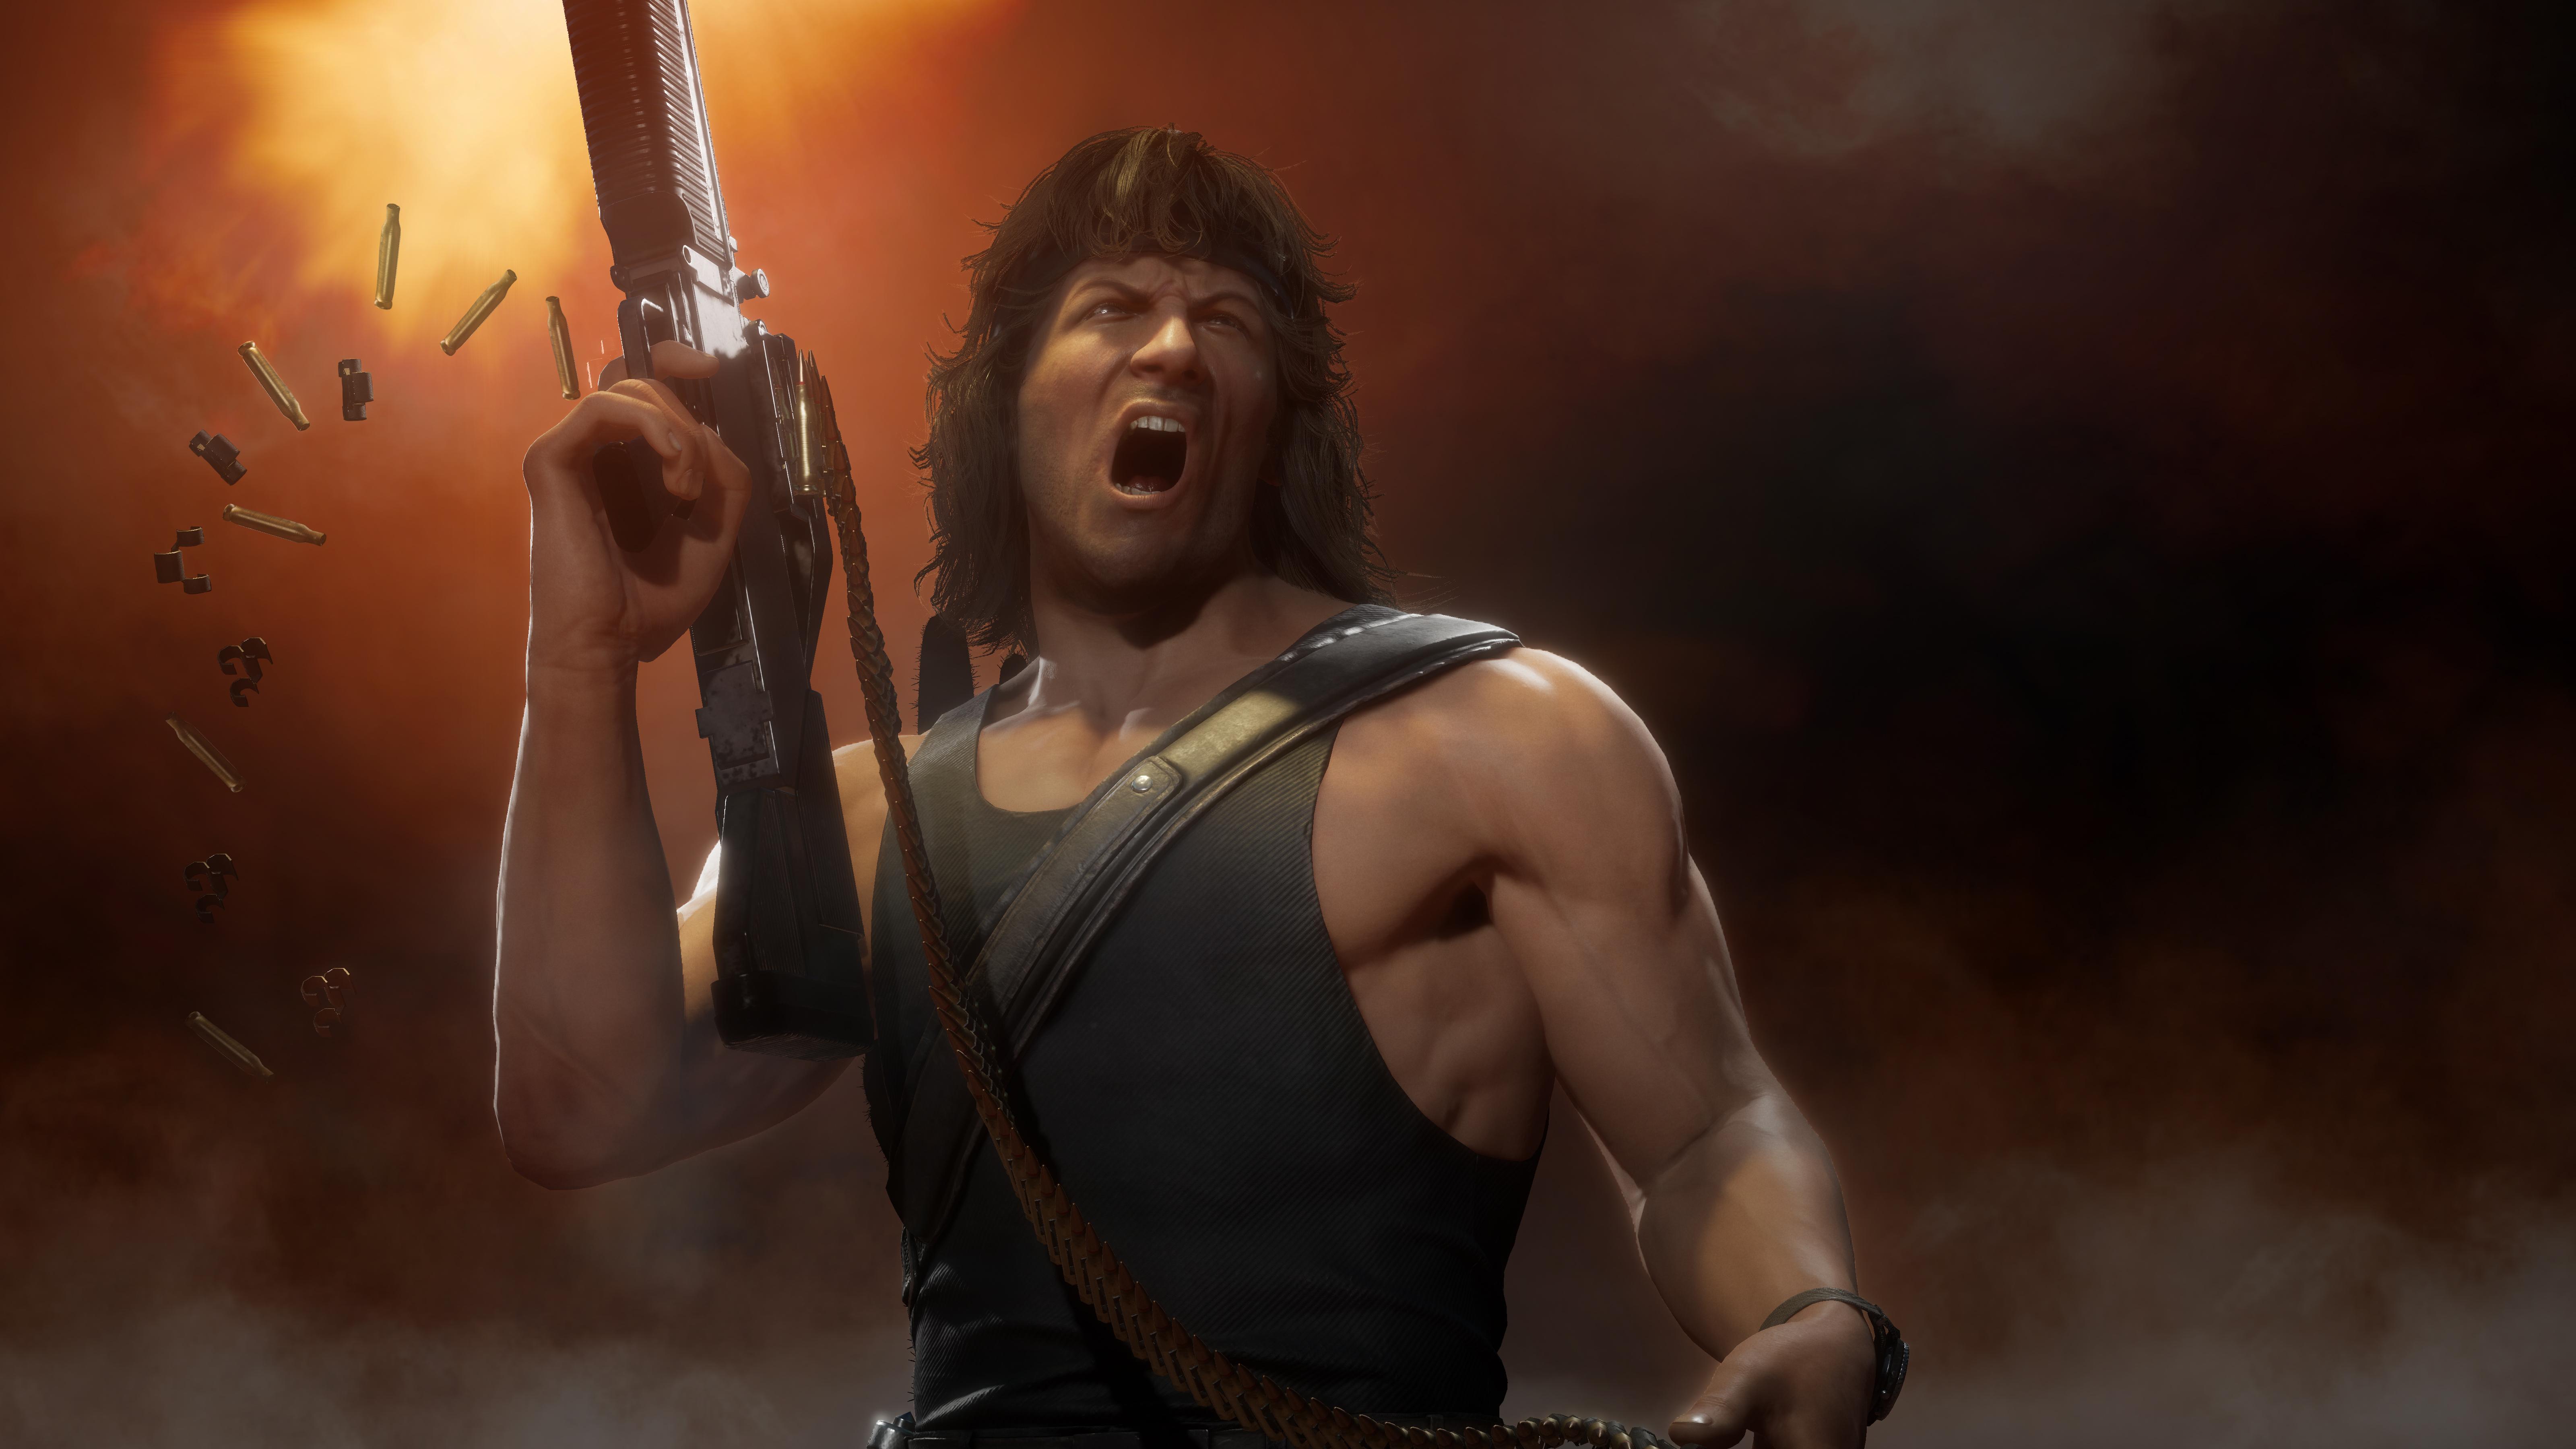 Rambo Goes Ham In New 'Mortal Kombat 11 Ultimate' Trailer